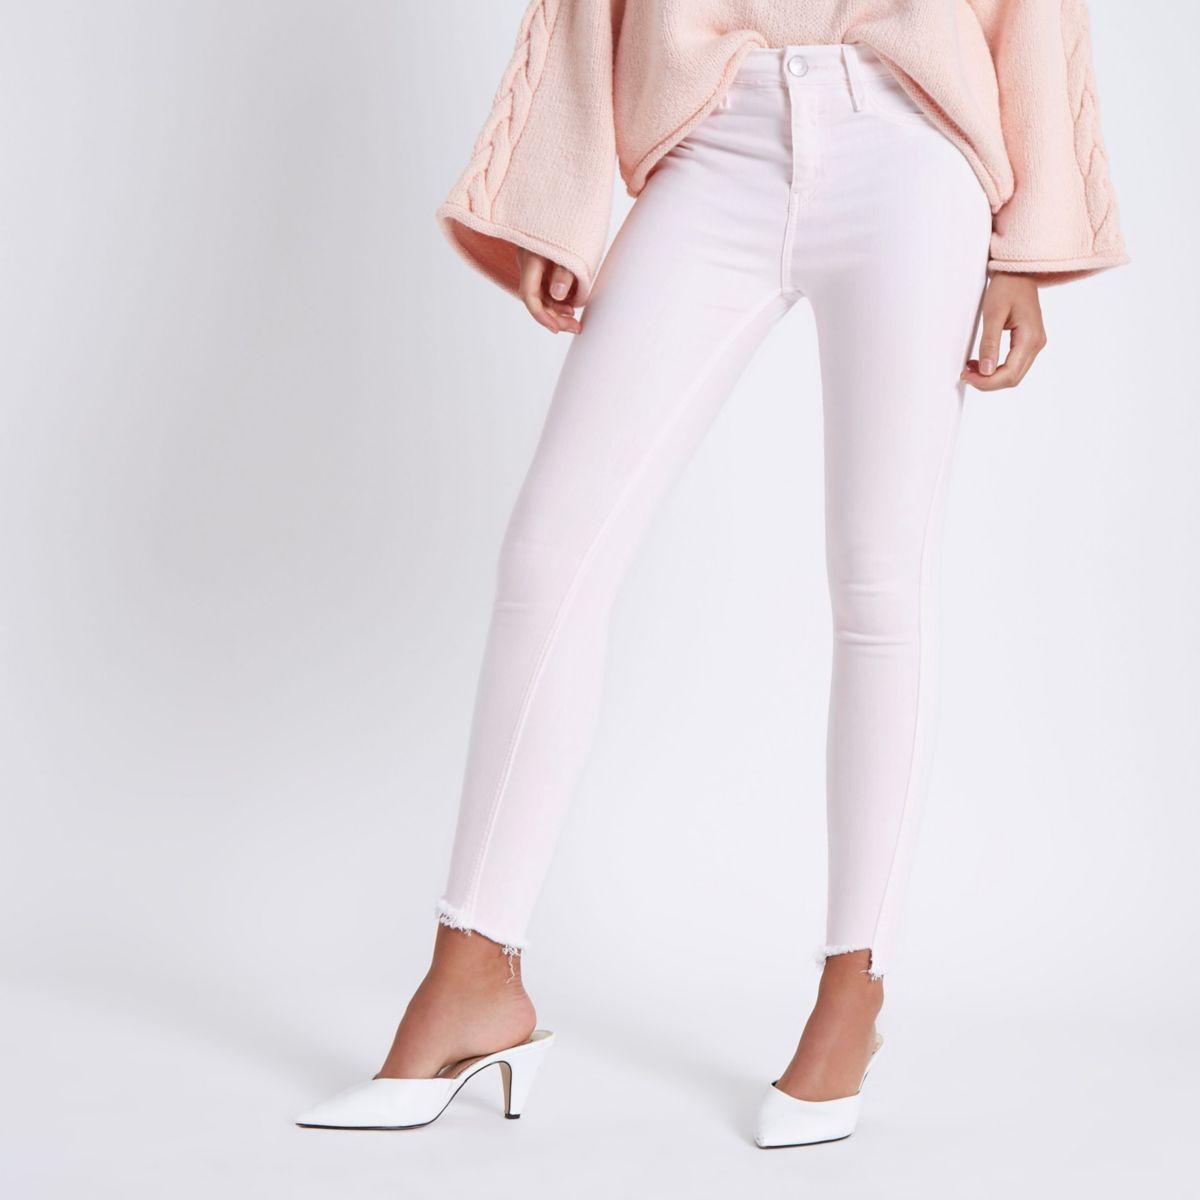 Free shipping and returns on Women's Pink Jeans & Denim at distrib-wjmx2fn9.ga